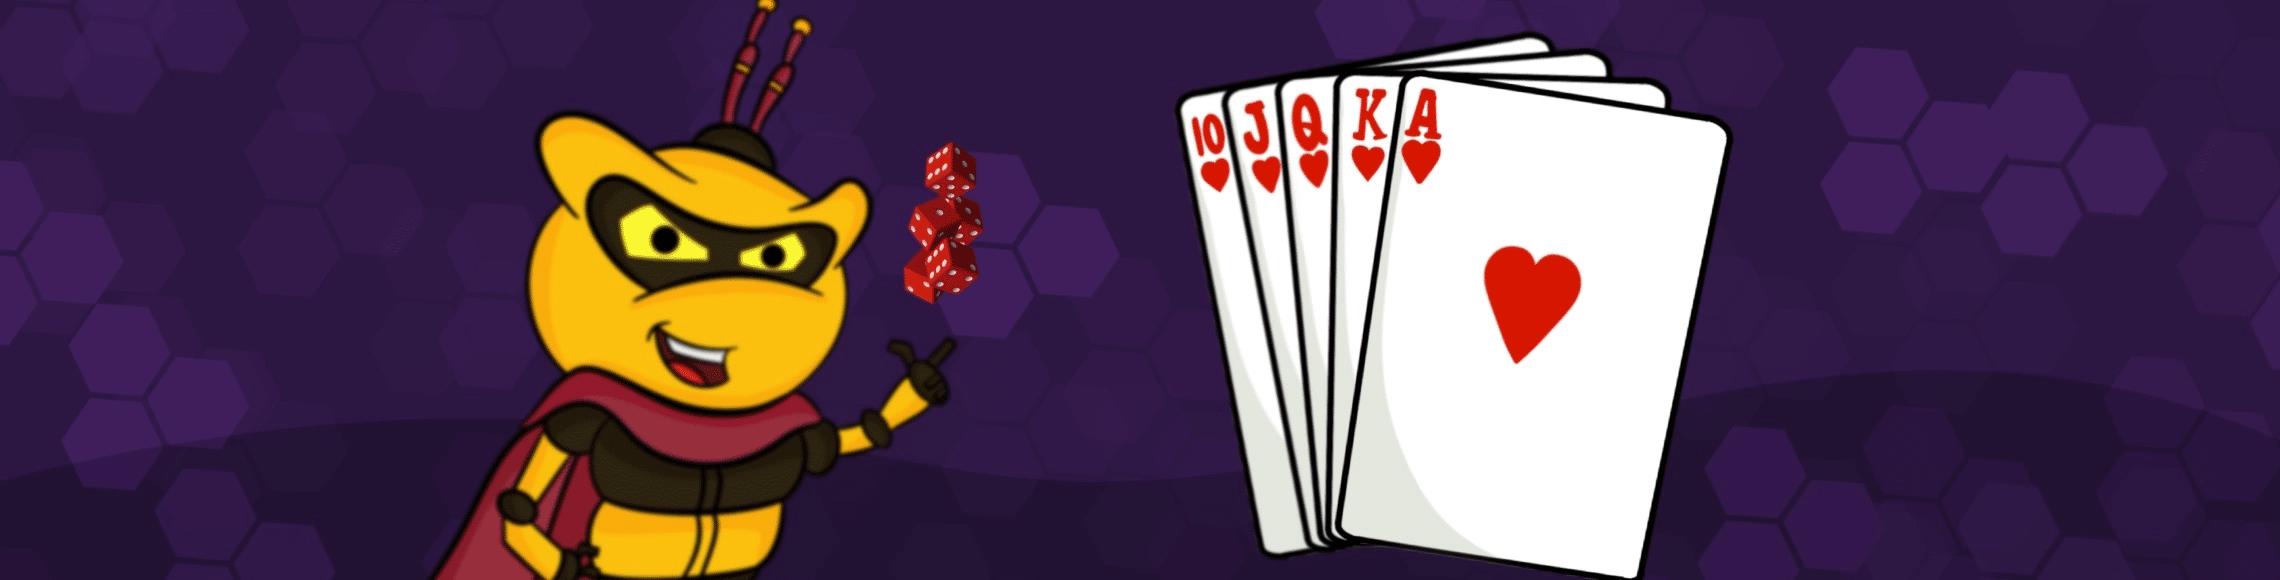 new online casinos nz